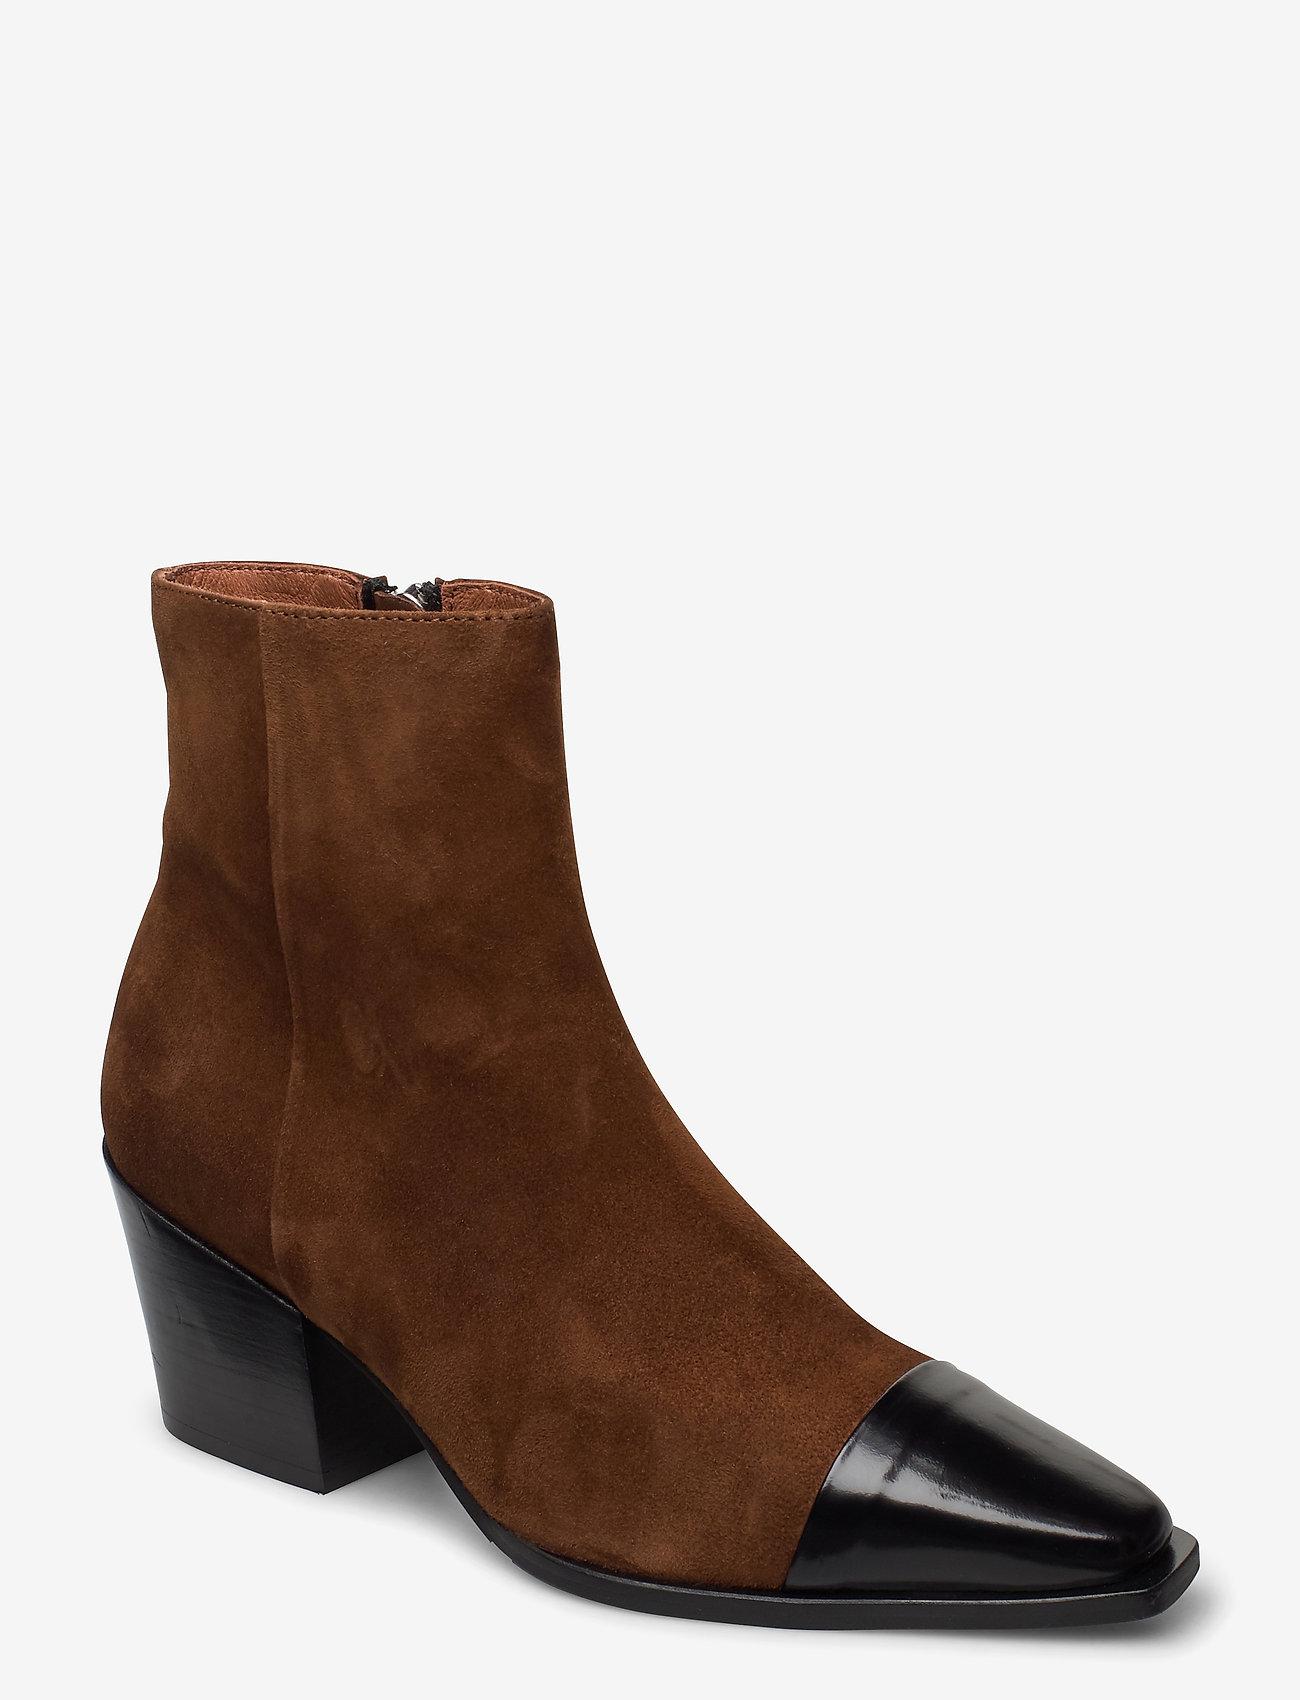 Billi Bi - Boots 4932 - wysoki obcas - bl.polido/lt.brown 976 sue.955 - 0